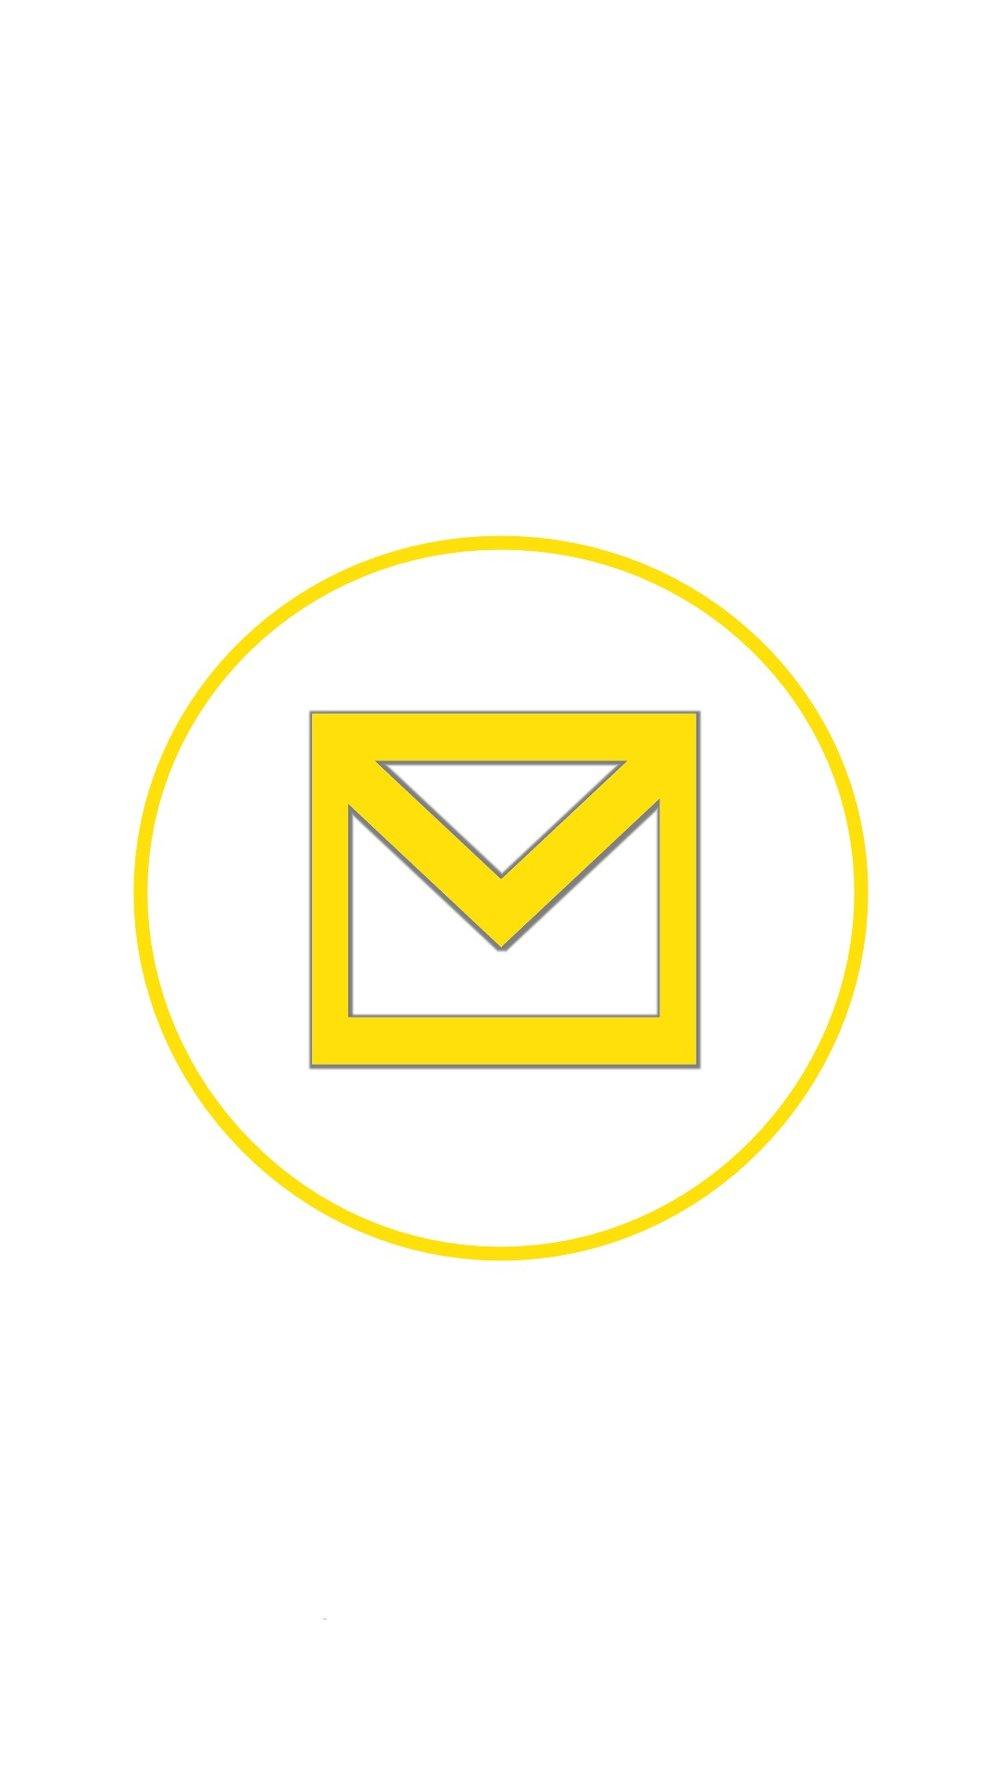 Instagram-cover-envelope-yellow-lotnotes.com.jpg